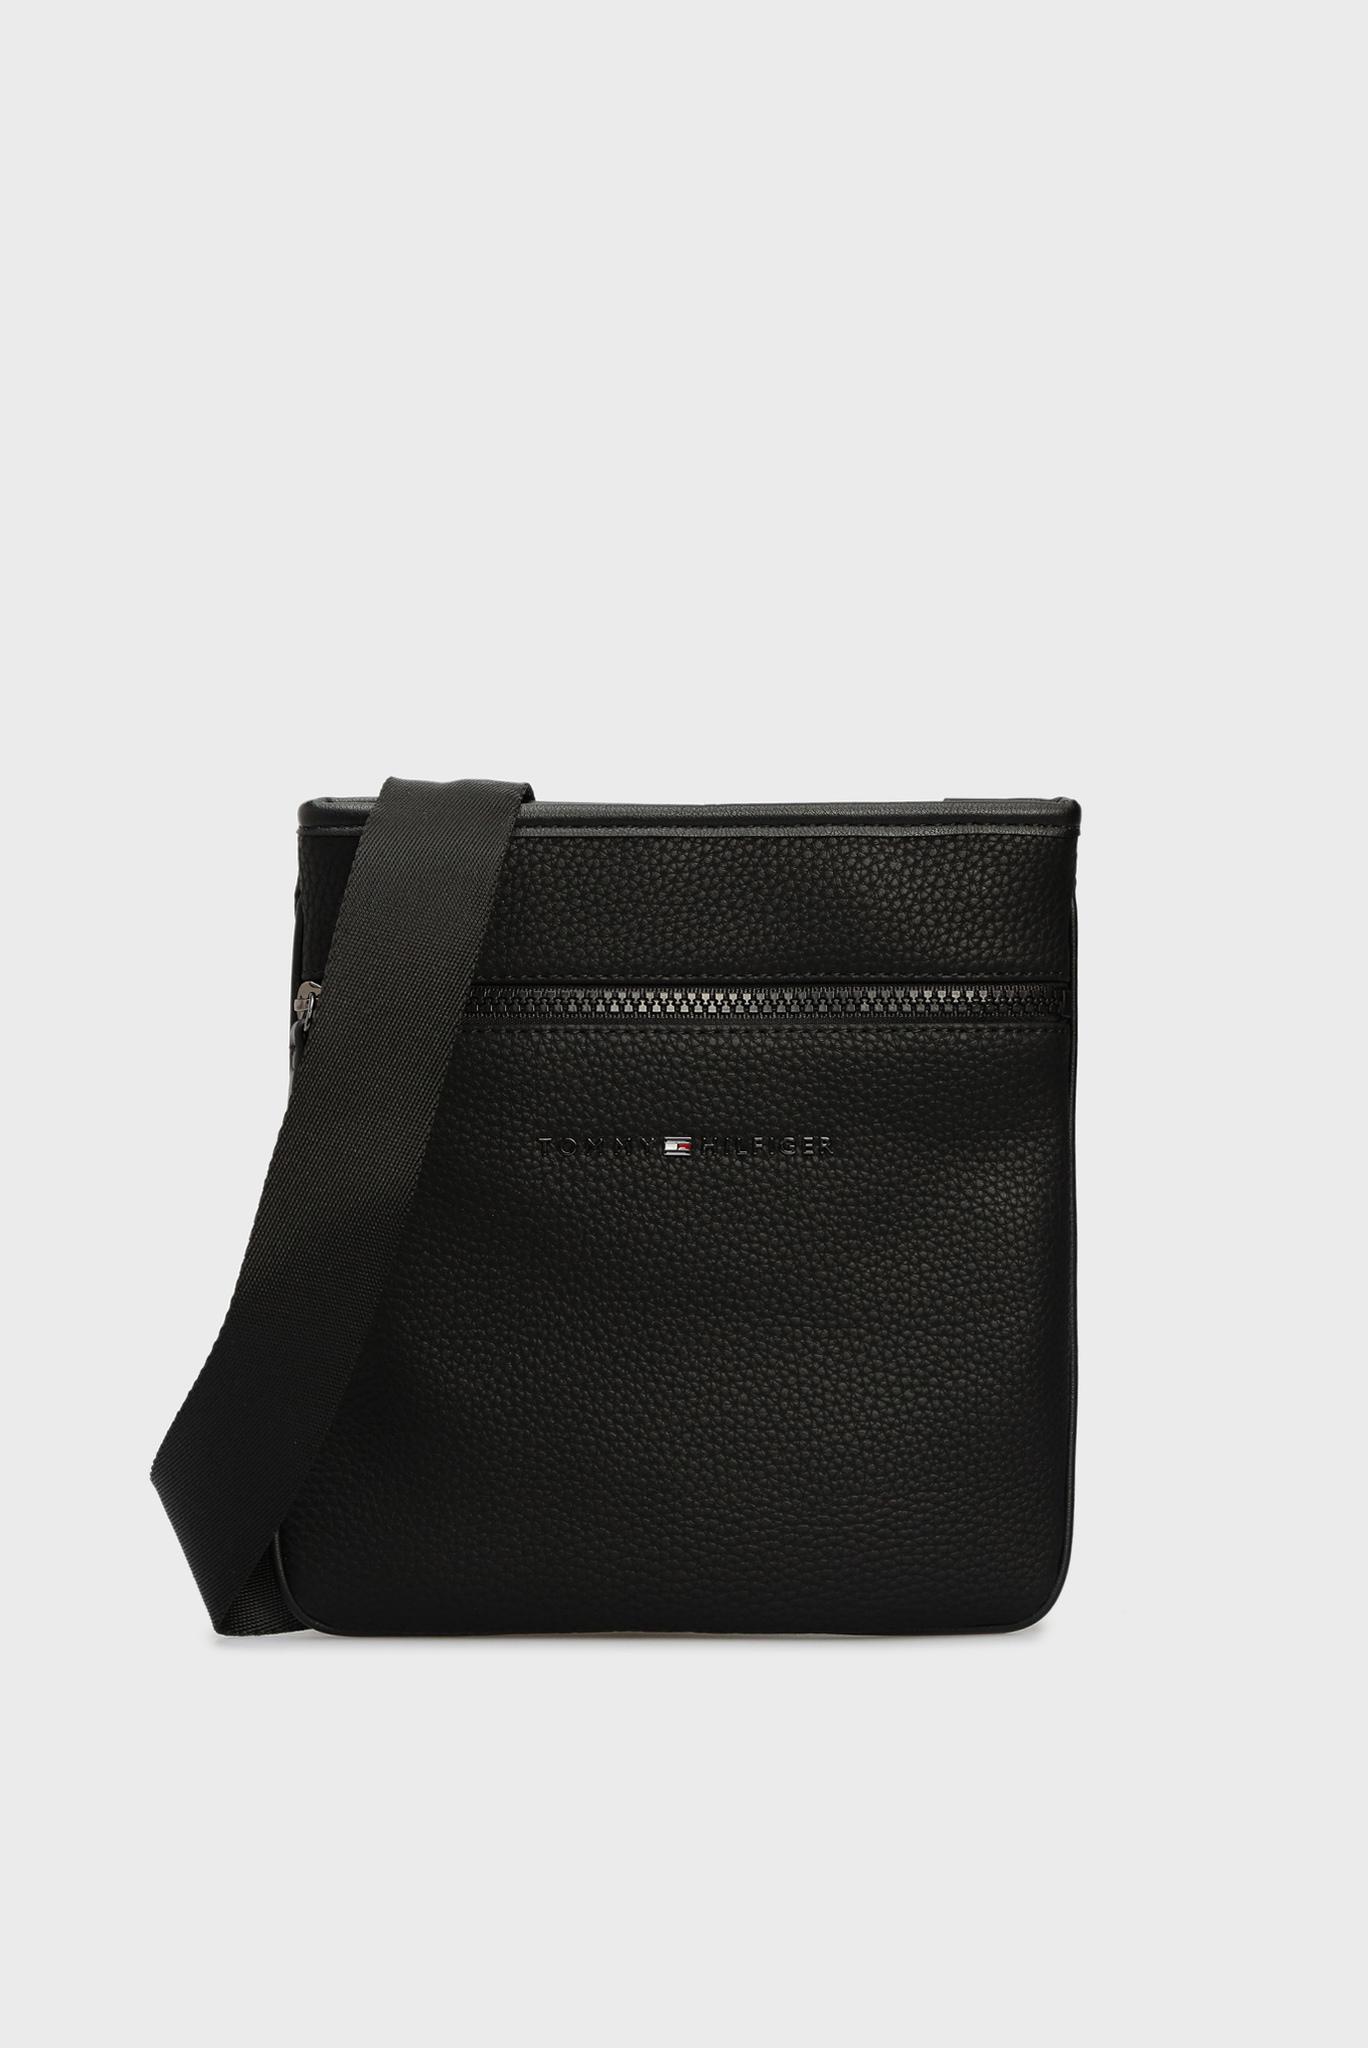 Мужская черная сумка через плечо ESSENTIAL Tommy Hilfiger